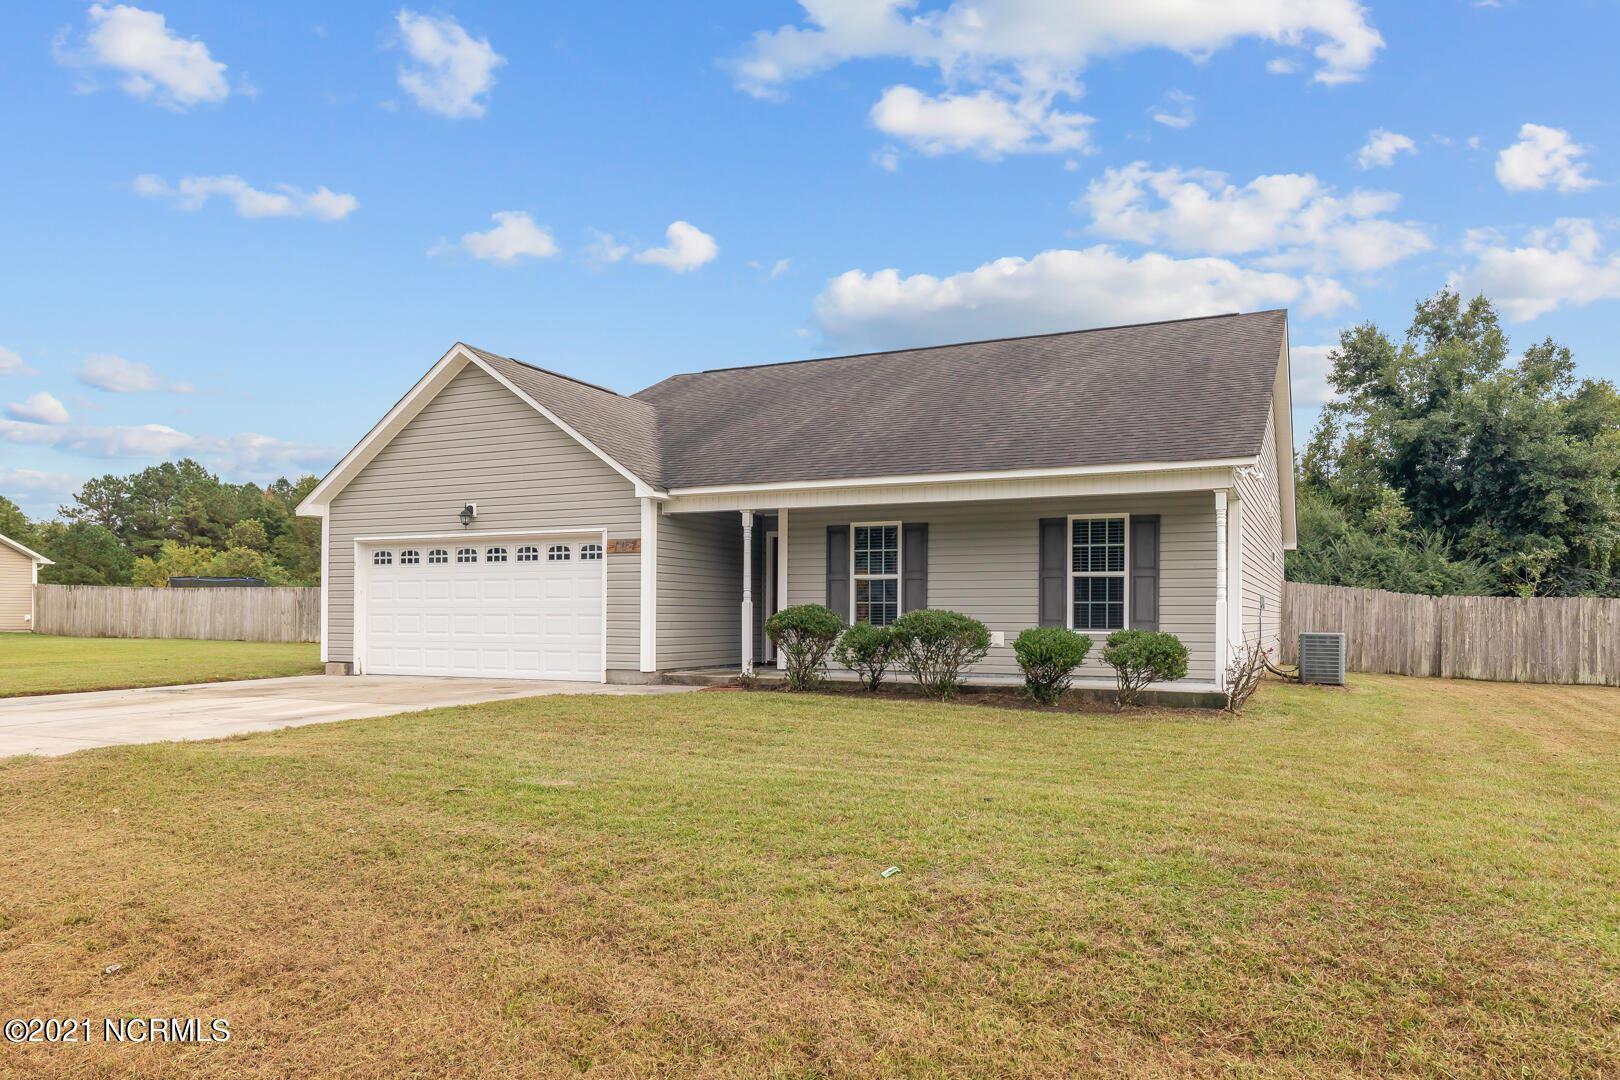 Photo of 107 Farmgate Drive, Richlands, NC 28574 (MLS # 100291591)